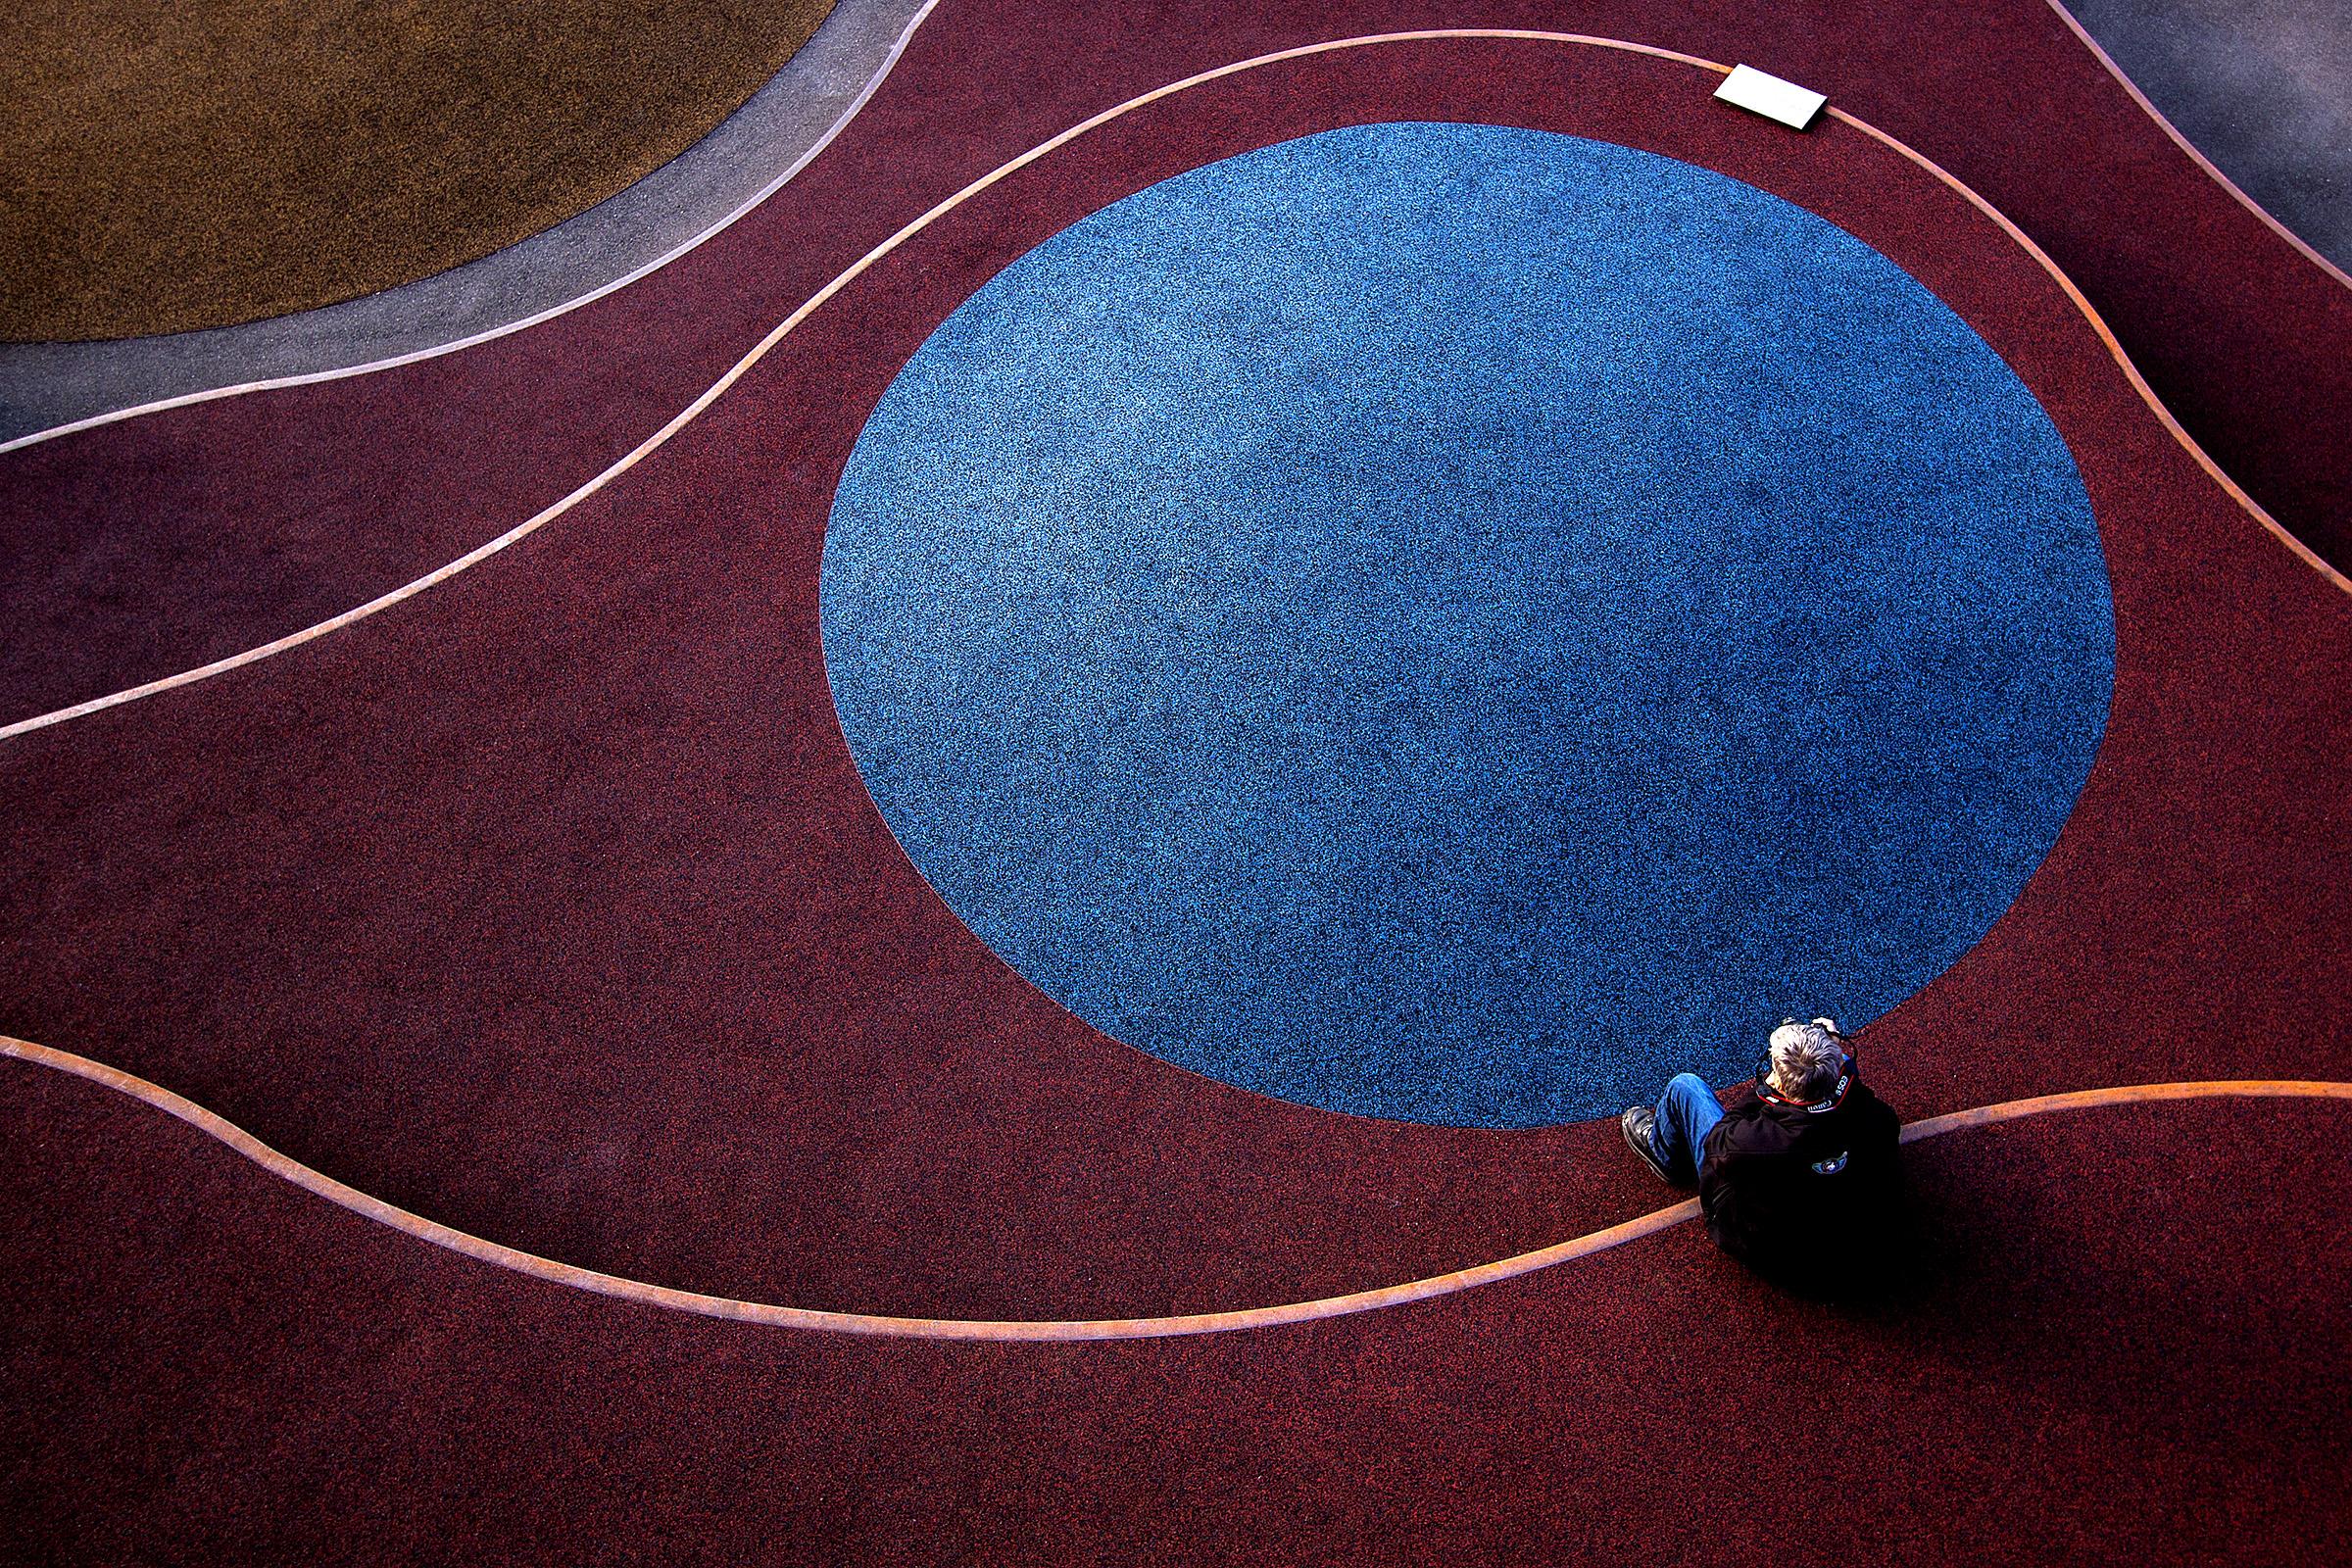 Blue Circle, Nicolai Godvin